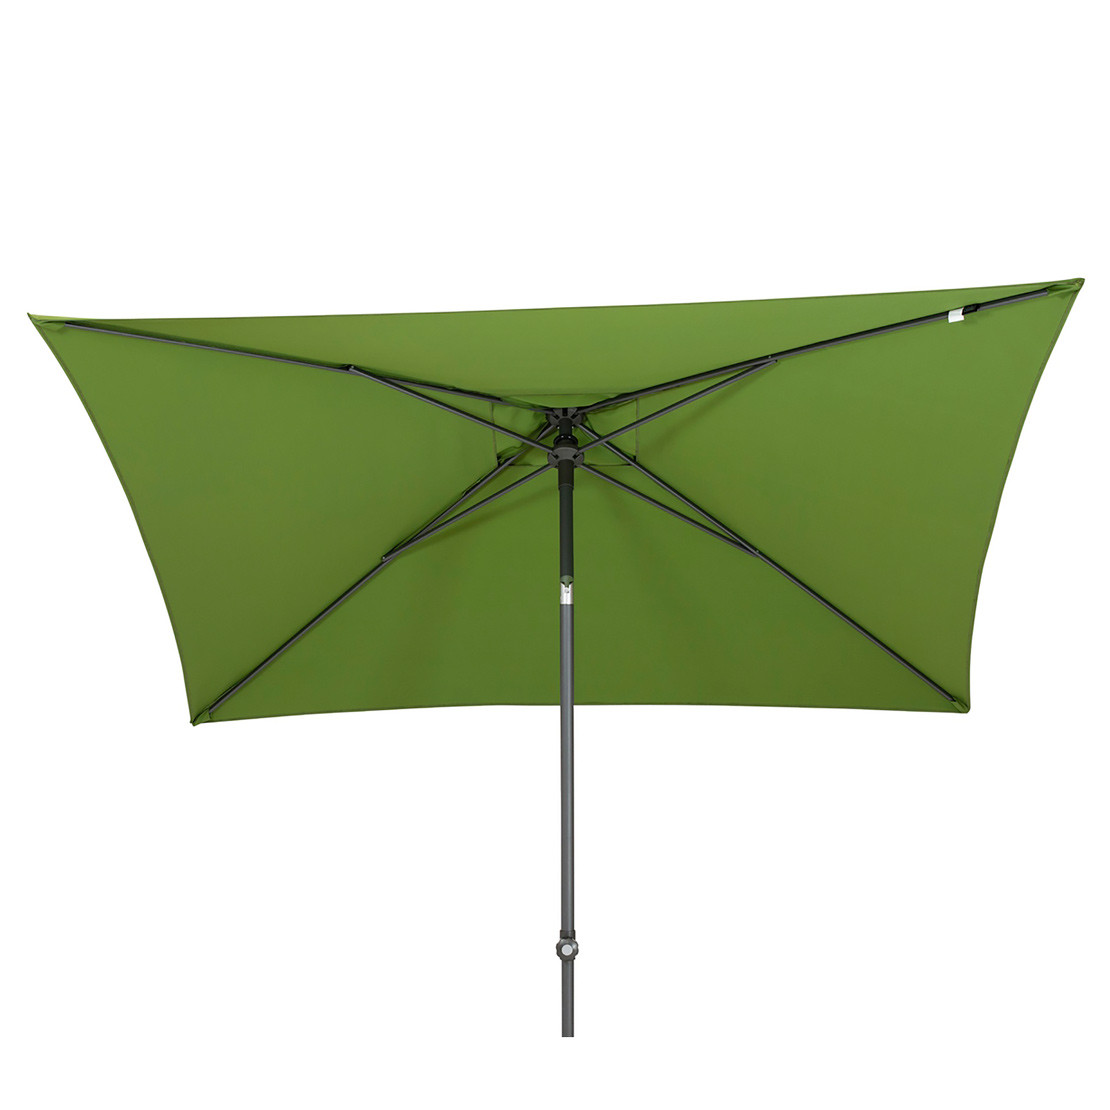 Oasis 200 x 250 cm Green